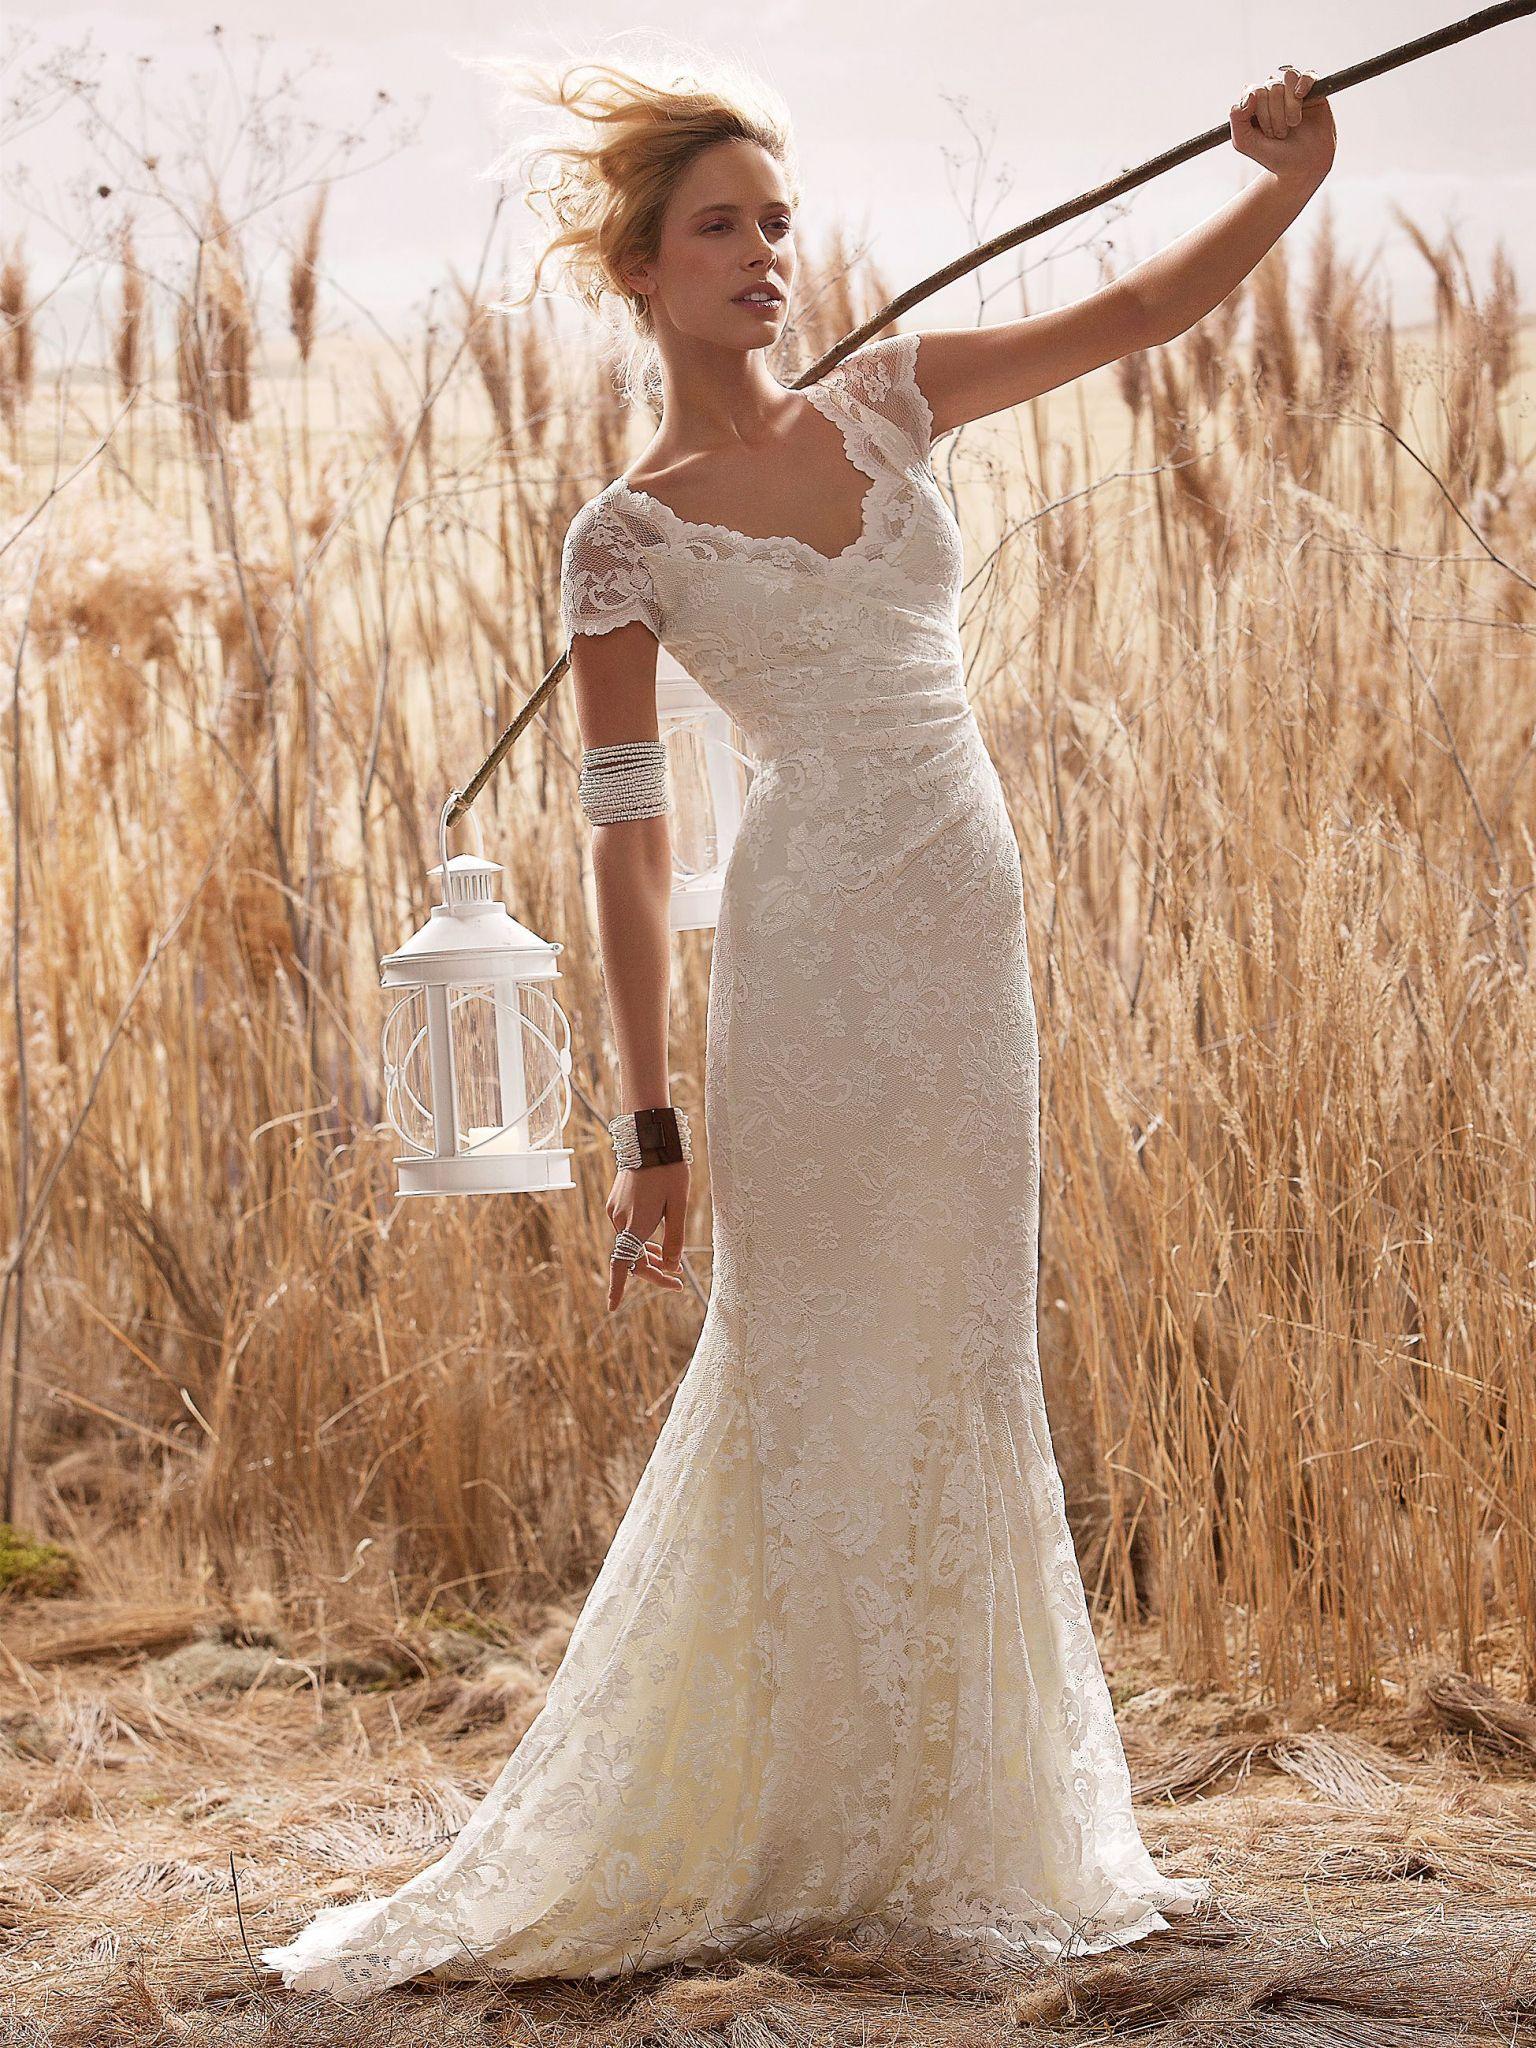 Dress for barn wedding womenus dresses for weddings check more at